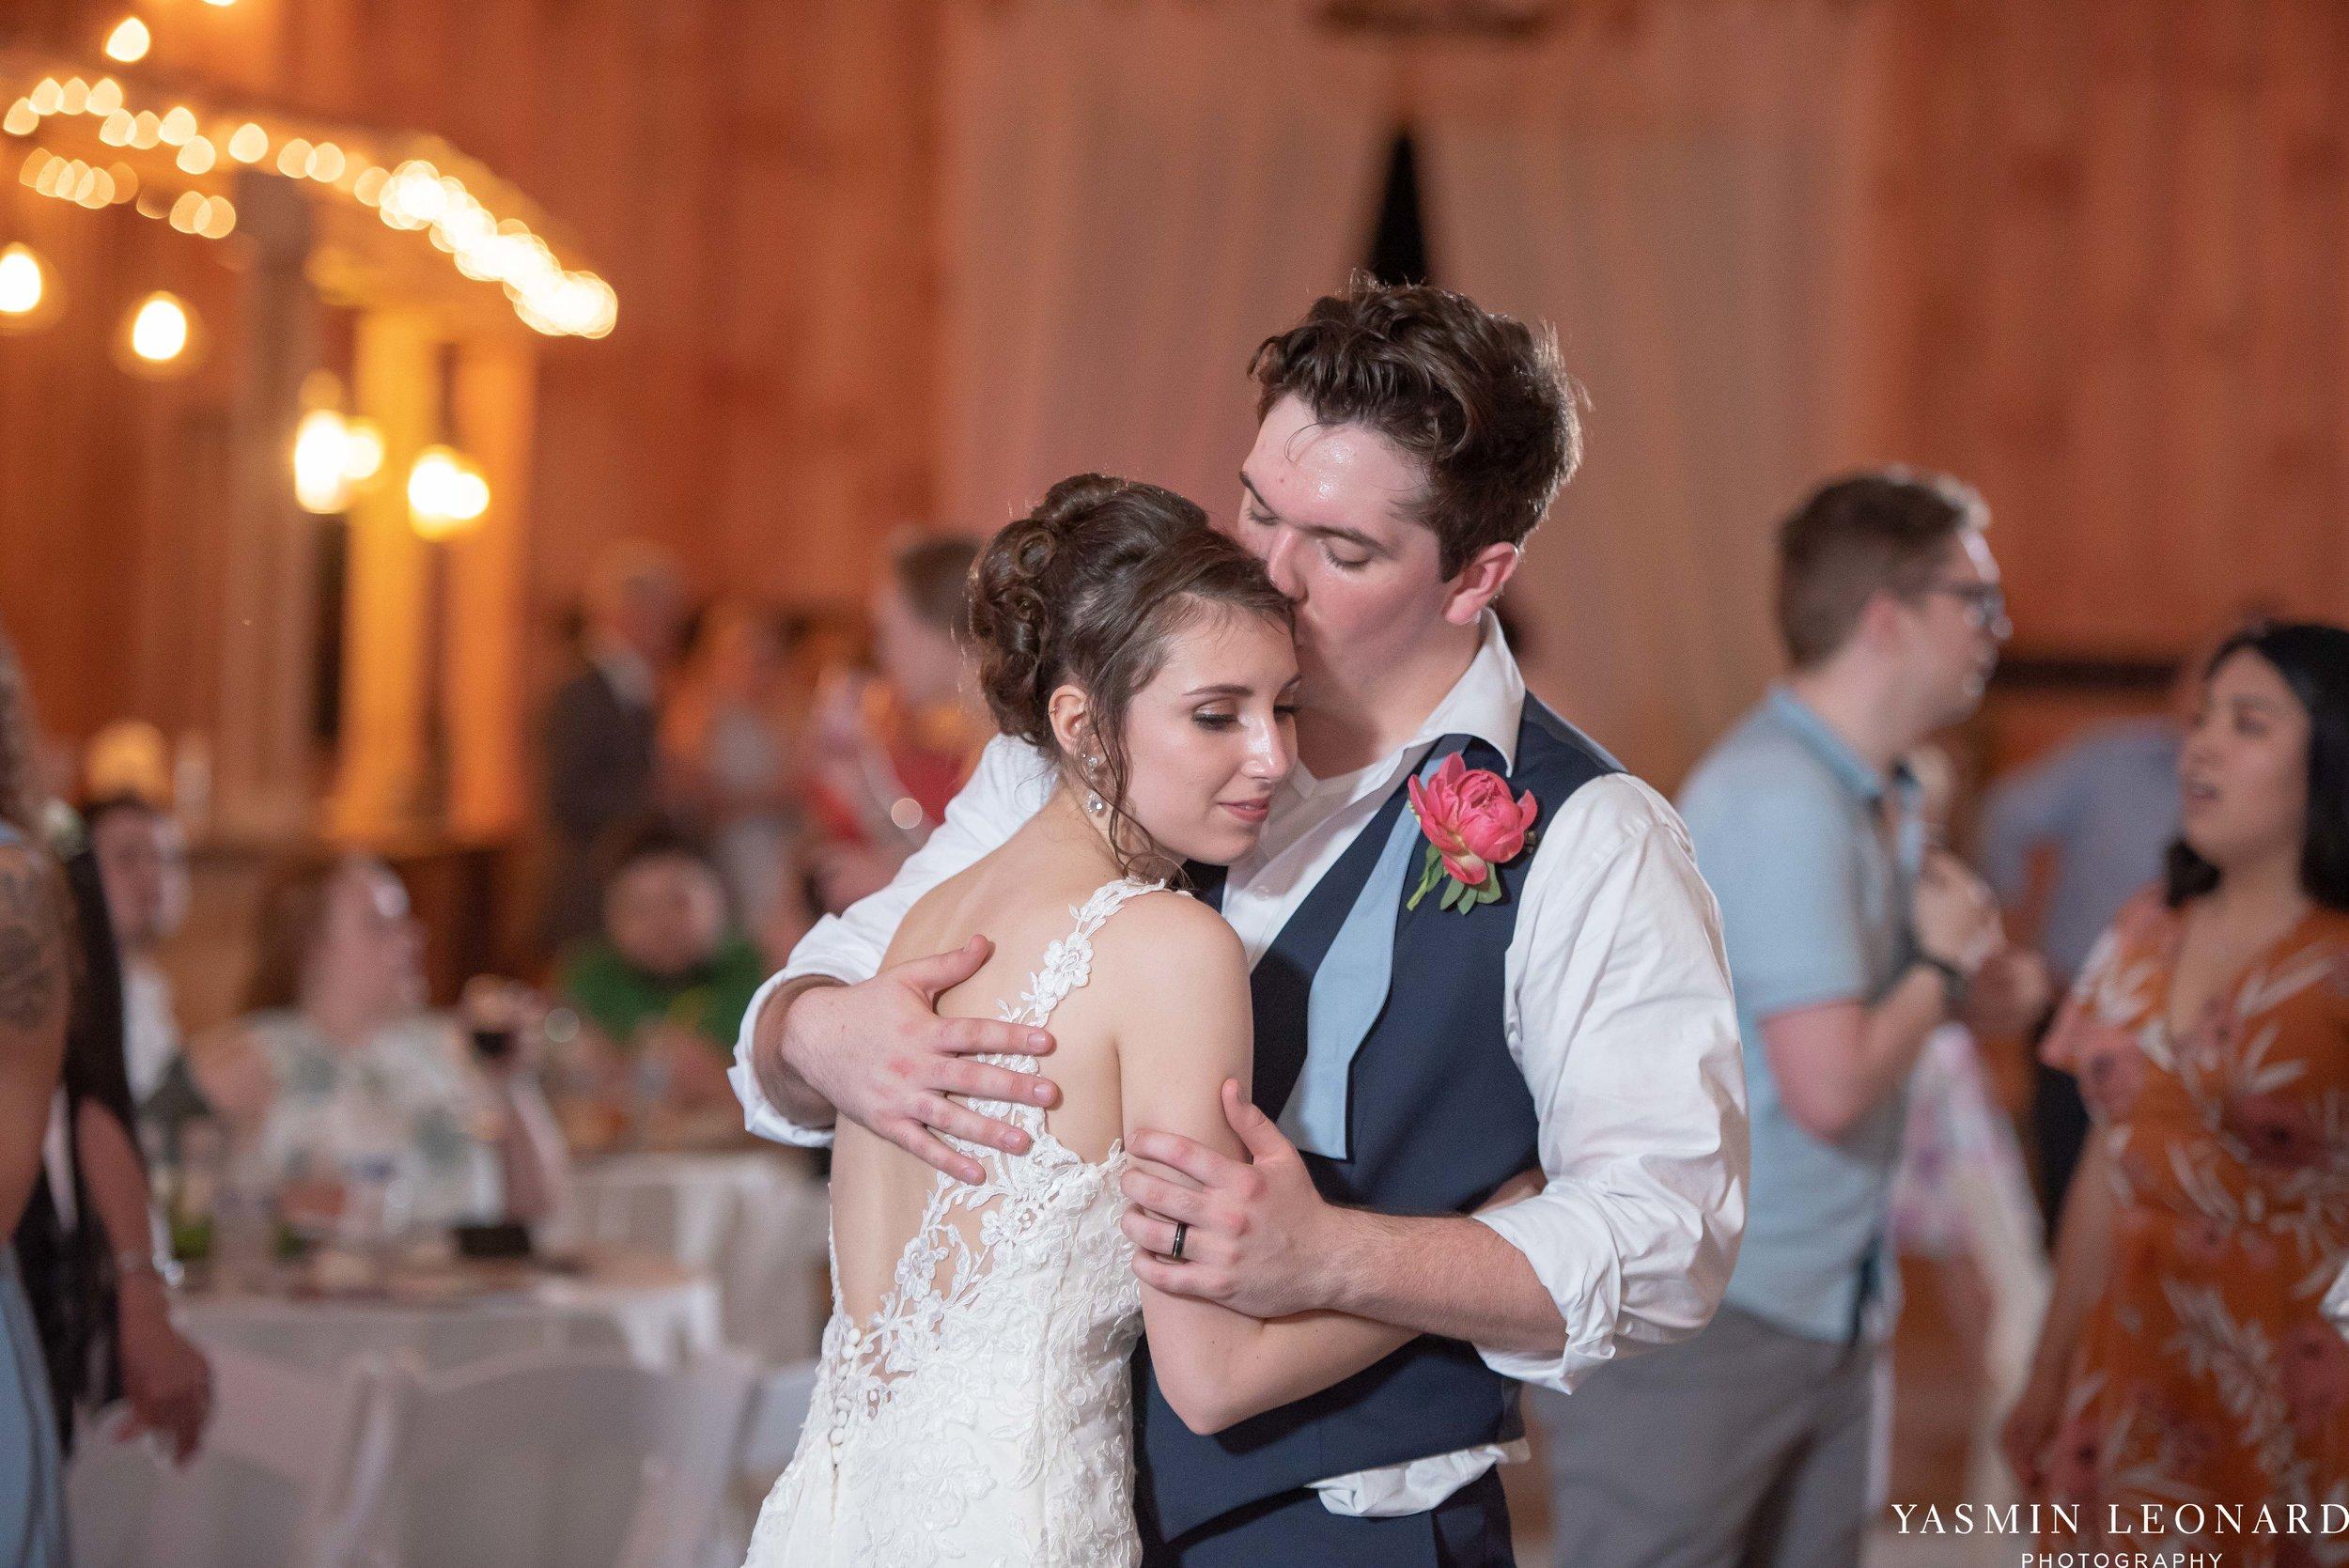 Old Homeplace Vineyard - NC Weddings - Outdoor Summer Weddings - Peony Boutique - Vineyard Wedding - NC Photographer - Yasmin Leonard Photography-80.jpg